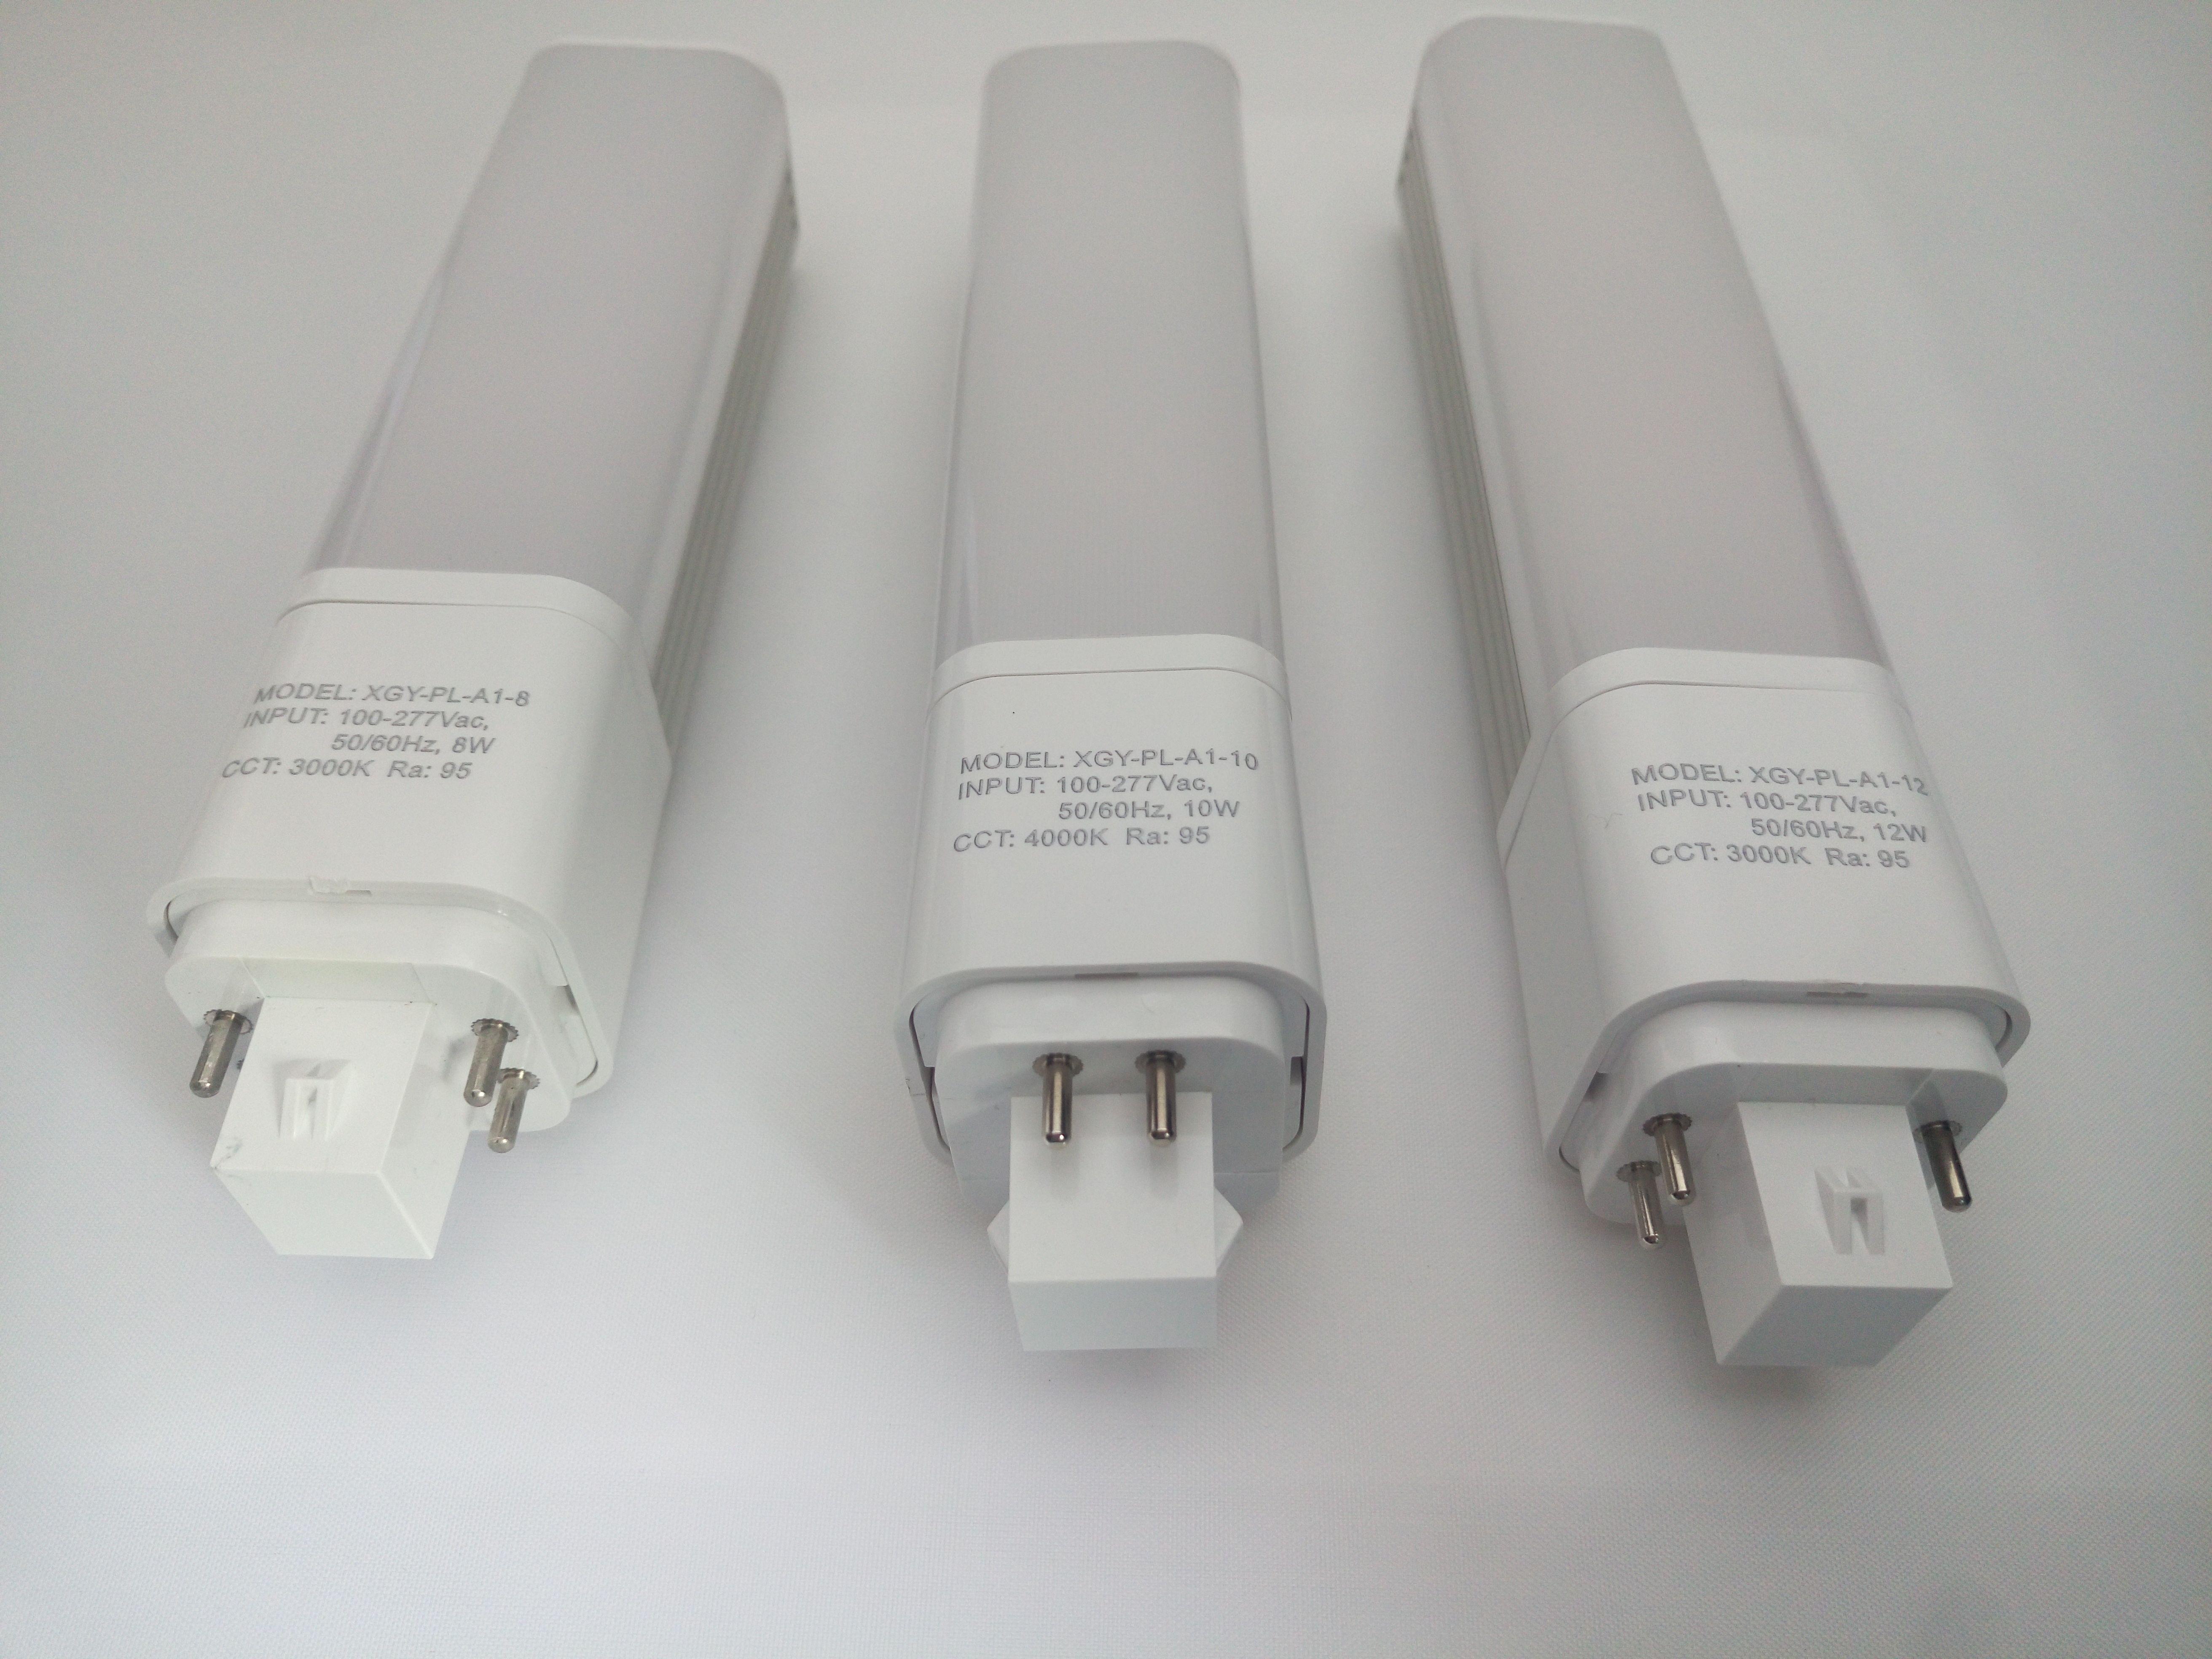 Led Pl Lamp G24q G24d Led Pl Lamp Etl Ul Ce Fcc Saa Led Pl Light Electronics Technology Led Usb Flash Drive